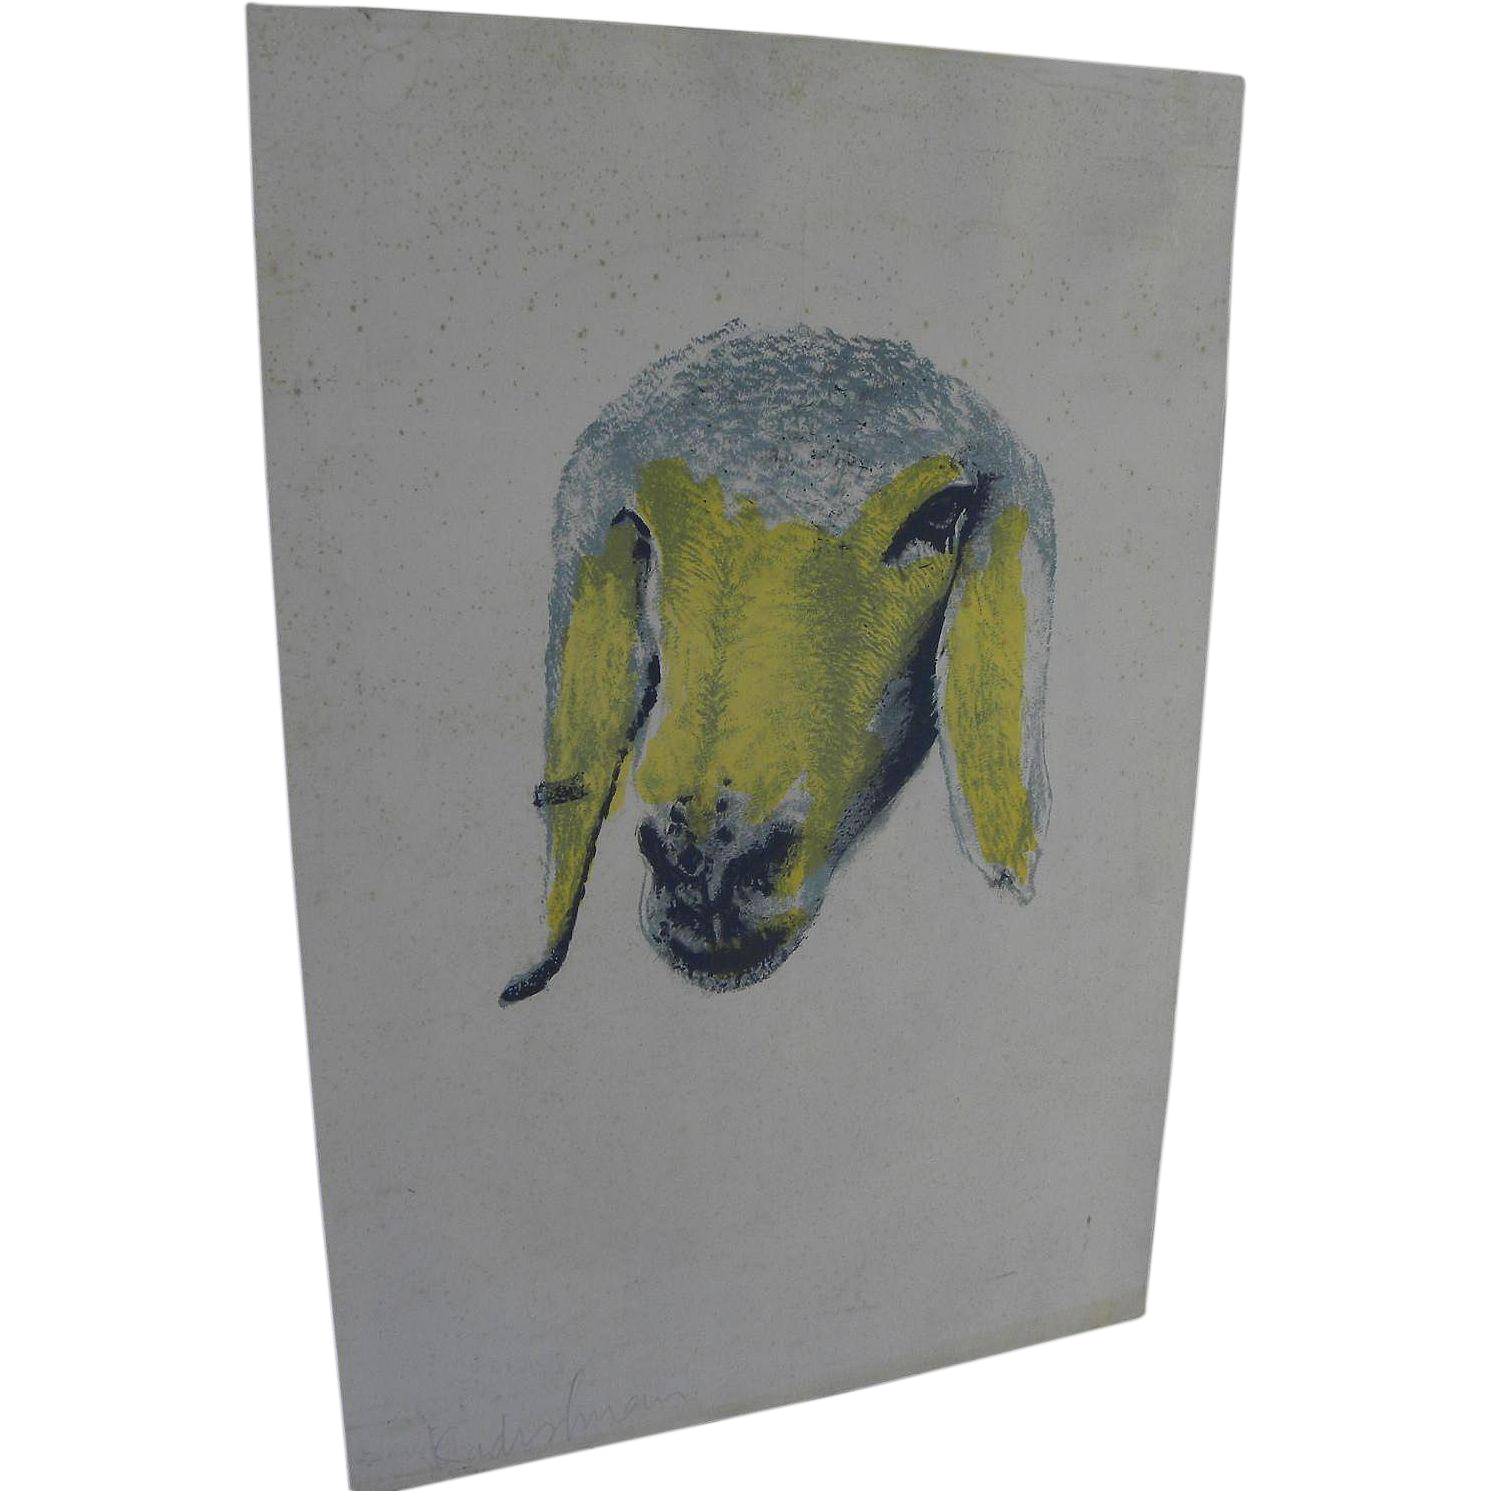 MENASHE KADISHMAN (1932-2015) Israeli art hand signed lithograph print of sheep head by major Jewish artist